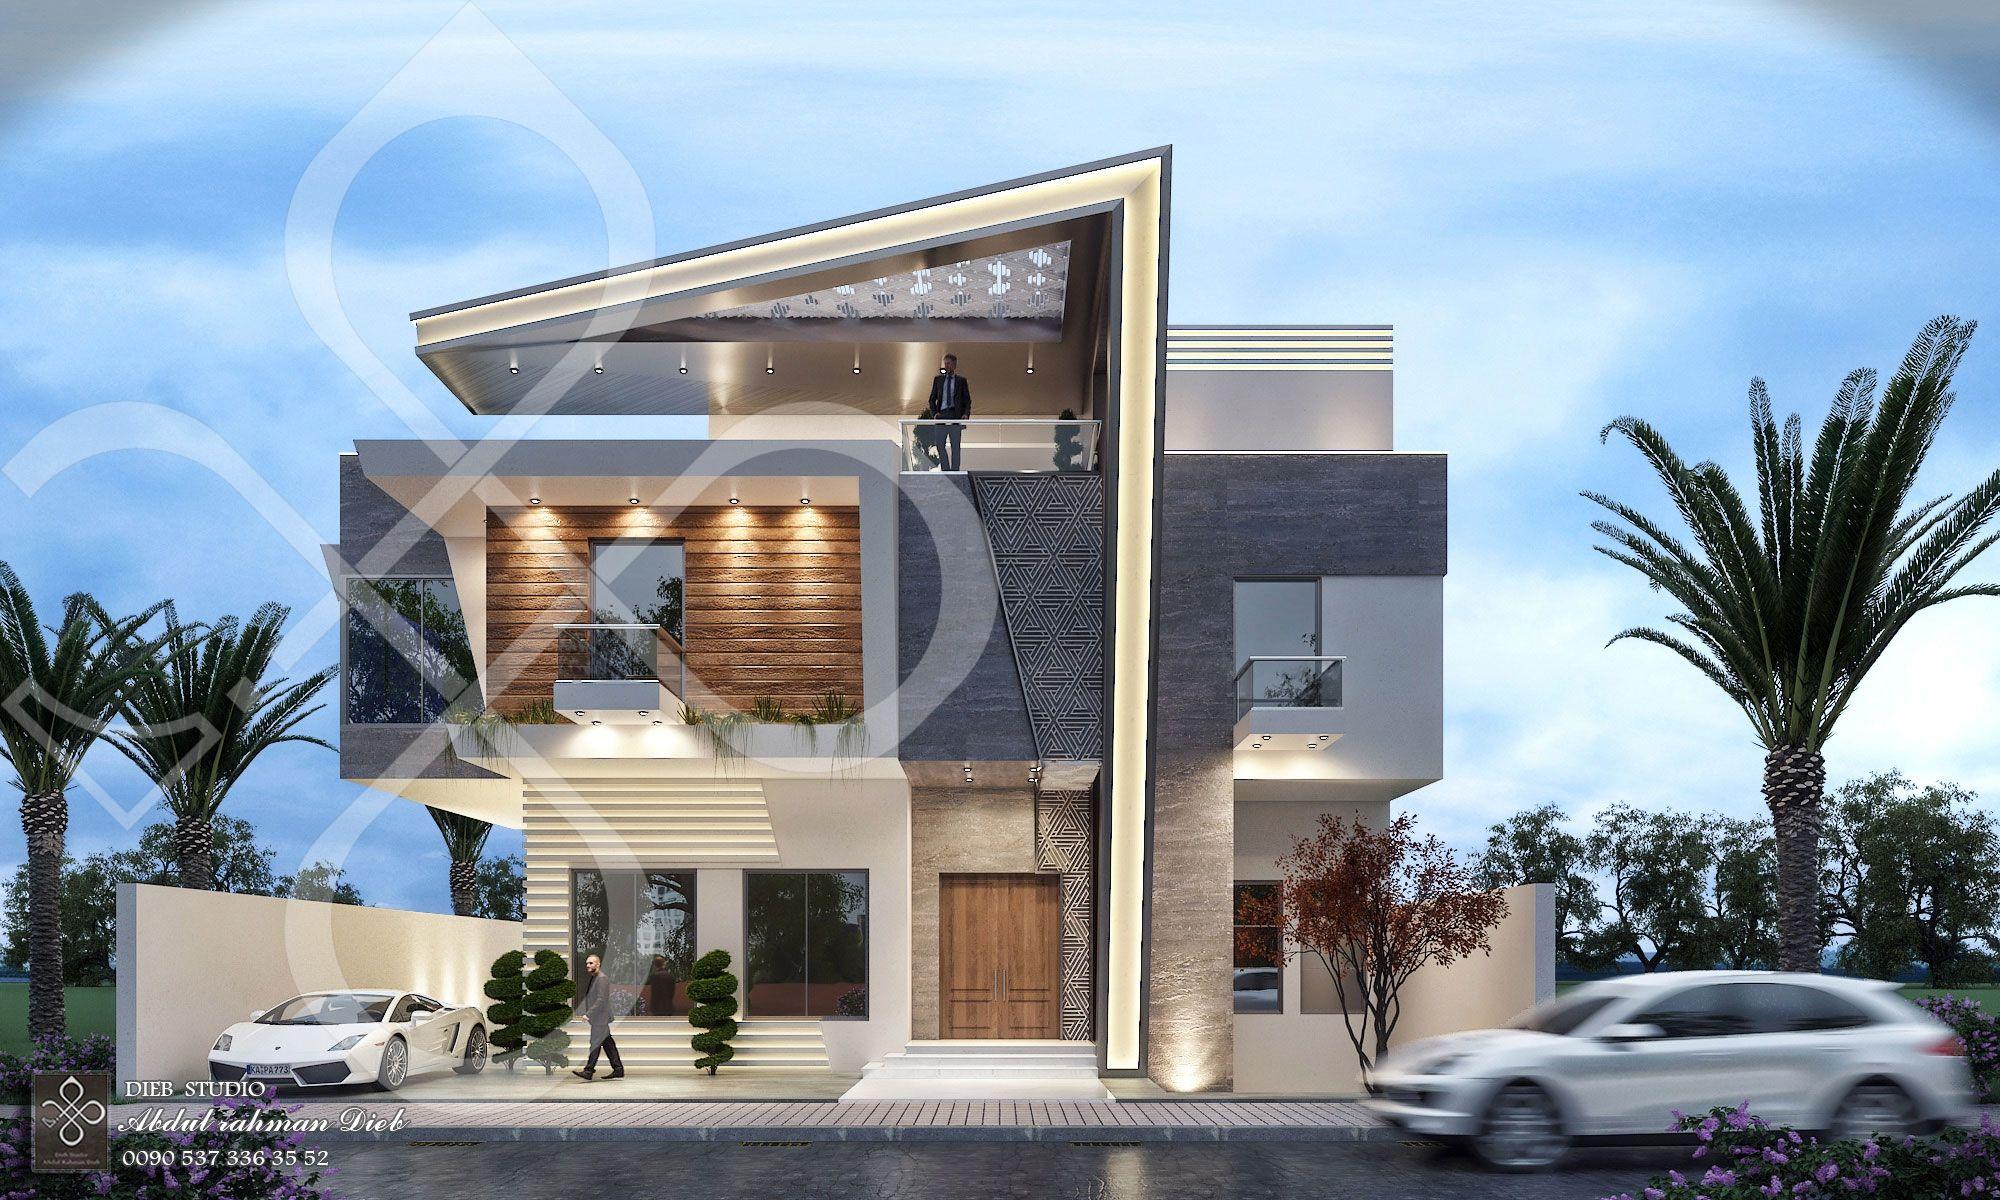 Dieb Studio Designed The Villa Sail In Libya According To The Style Of Modern In 2020 Modern Architecture Building Modern Exterior House Designs Modern Villa Design